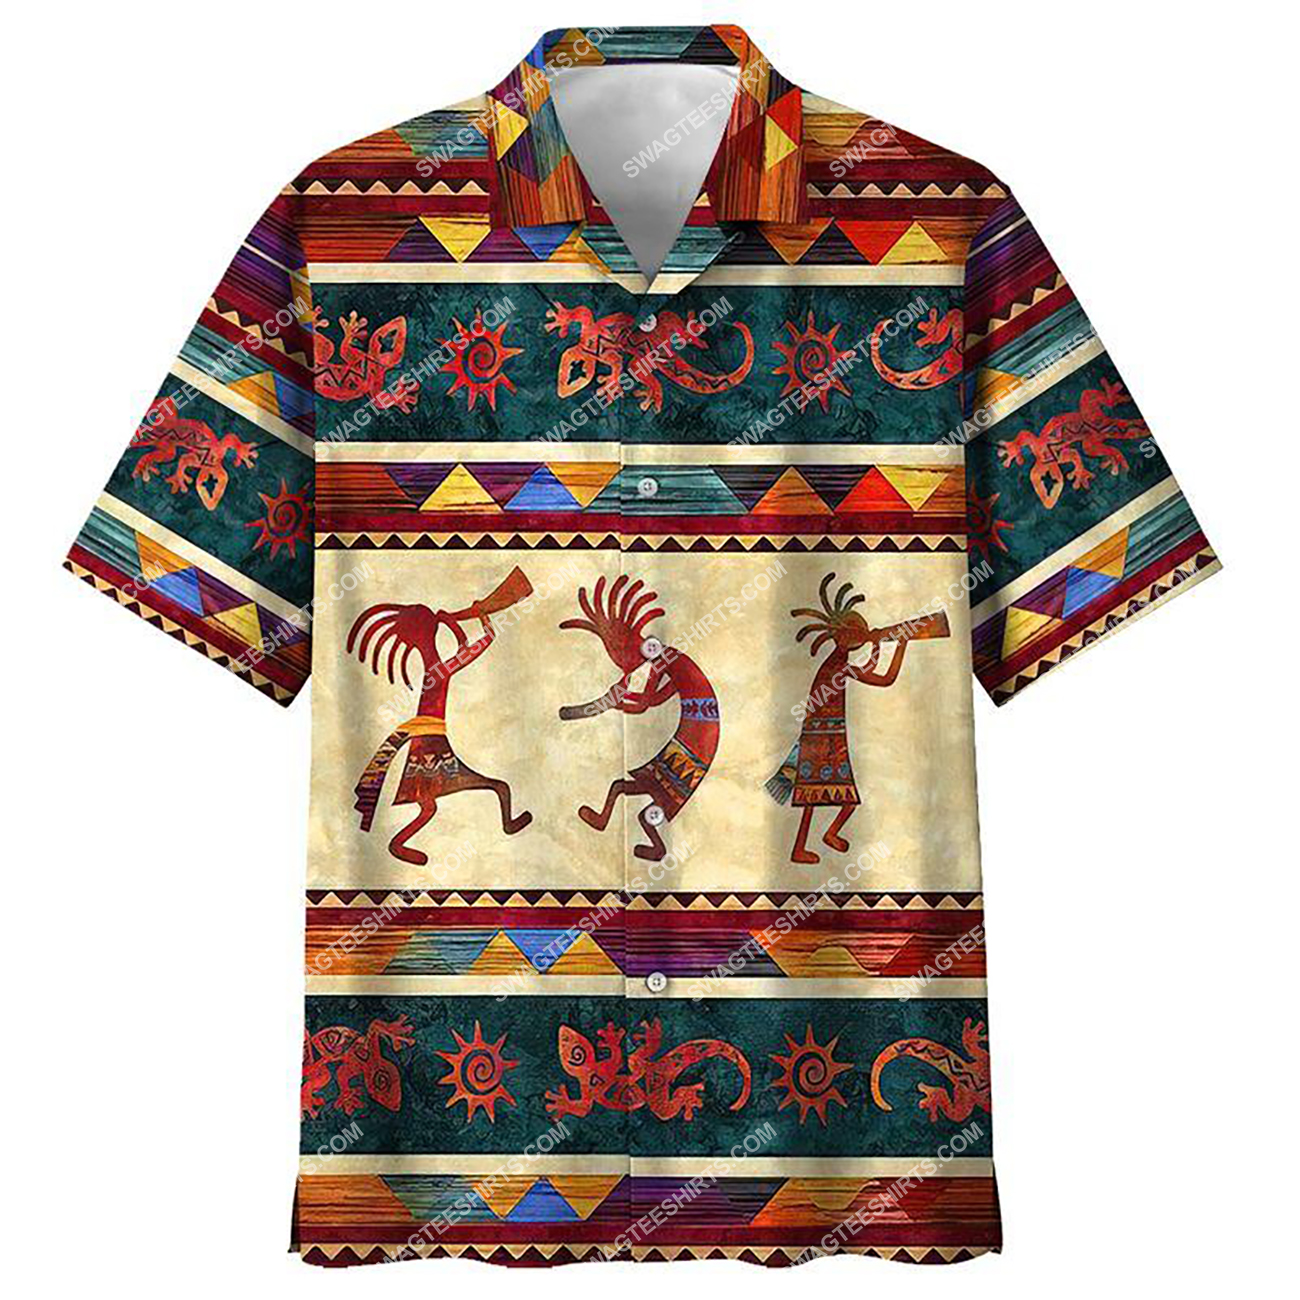 vintage native american culture all over printed hawaiian shirt 1(1)